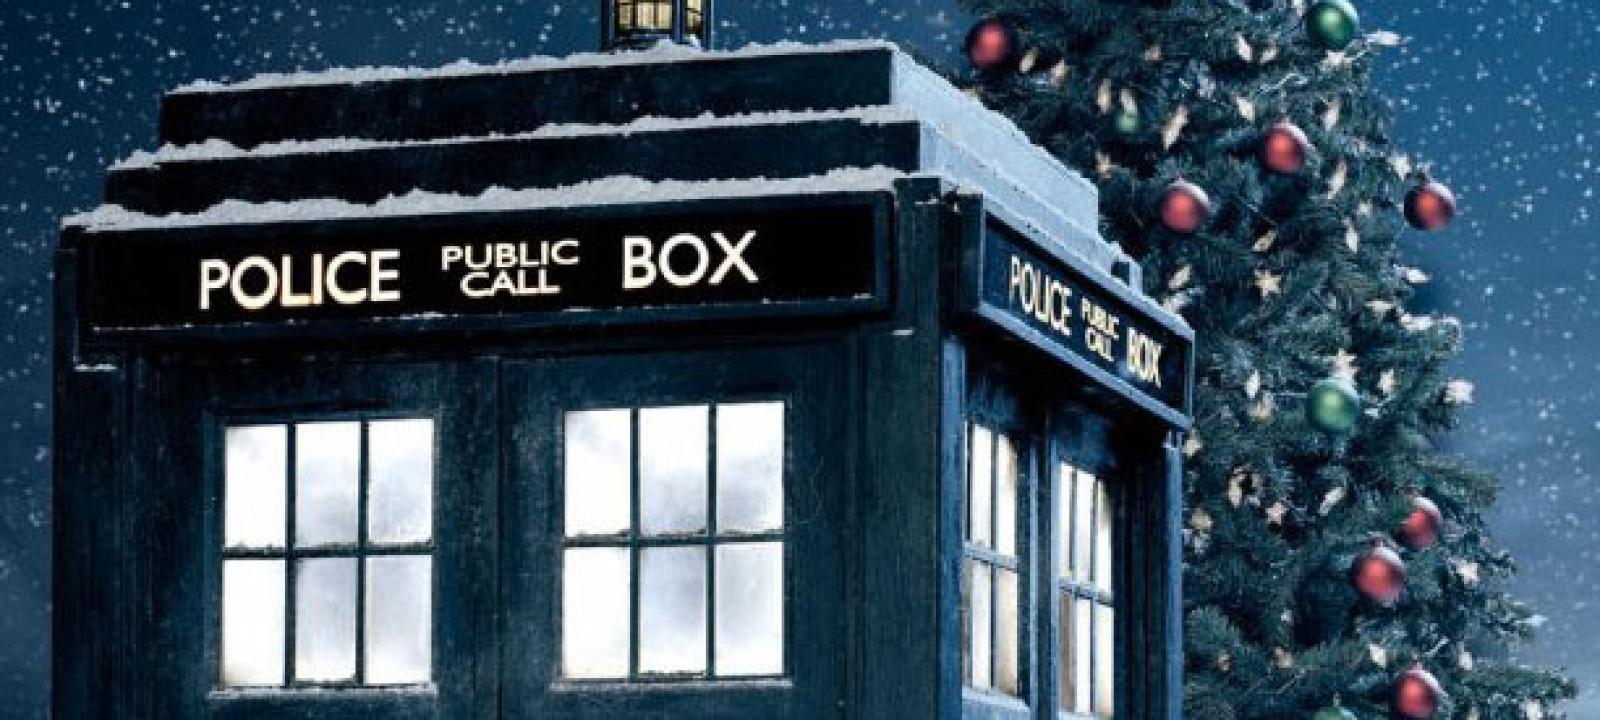 Festive TARDIS